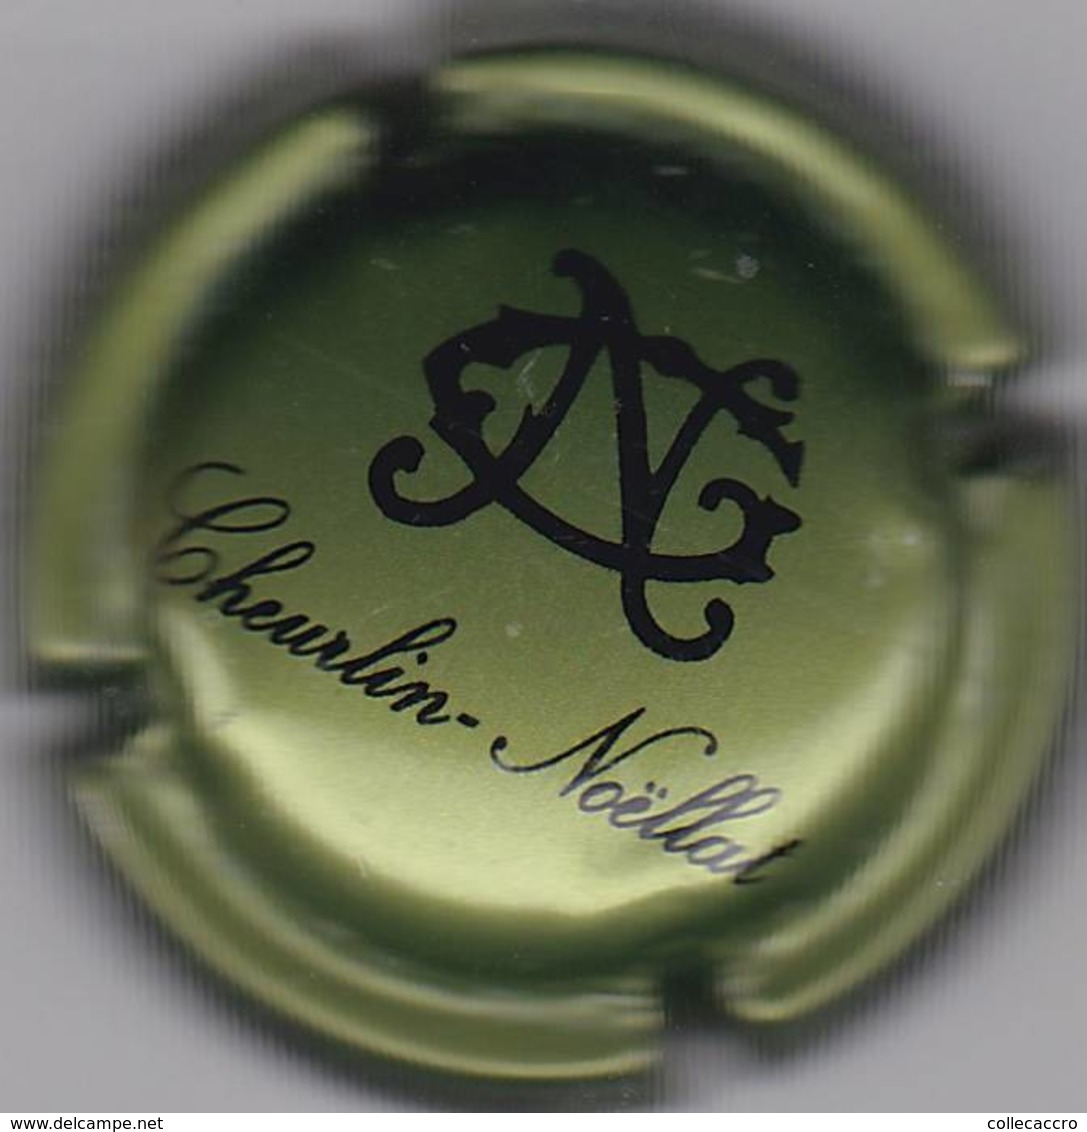 CHEURLIN-NOELLAT N°47b NOUVELLE - Champagne